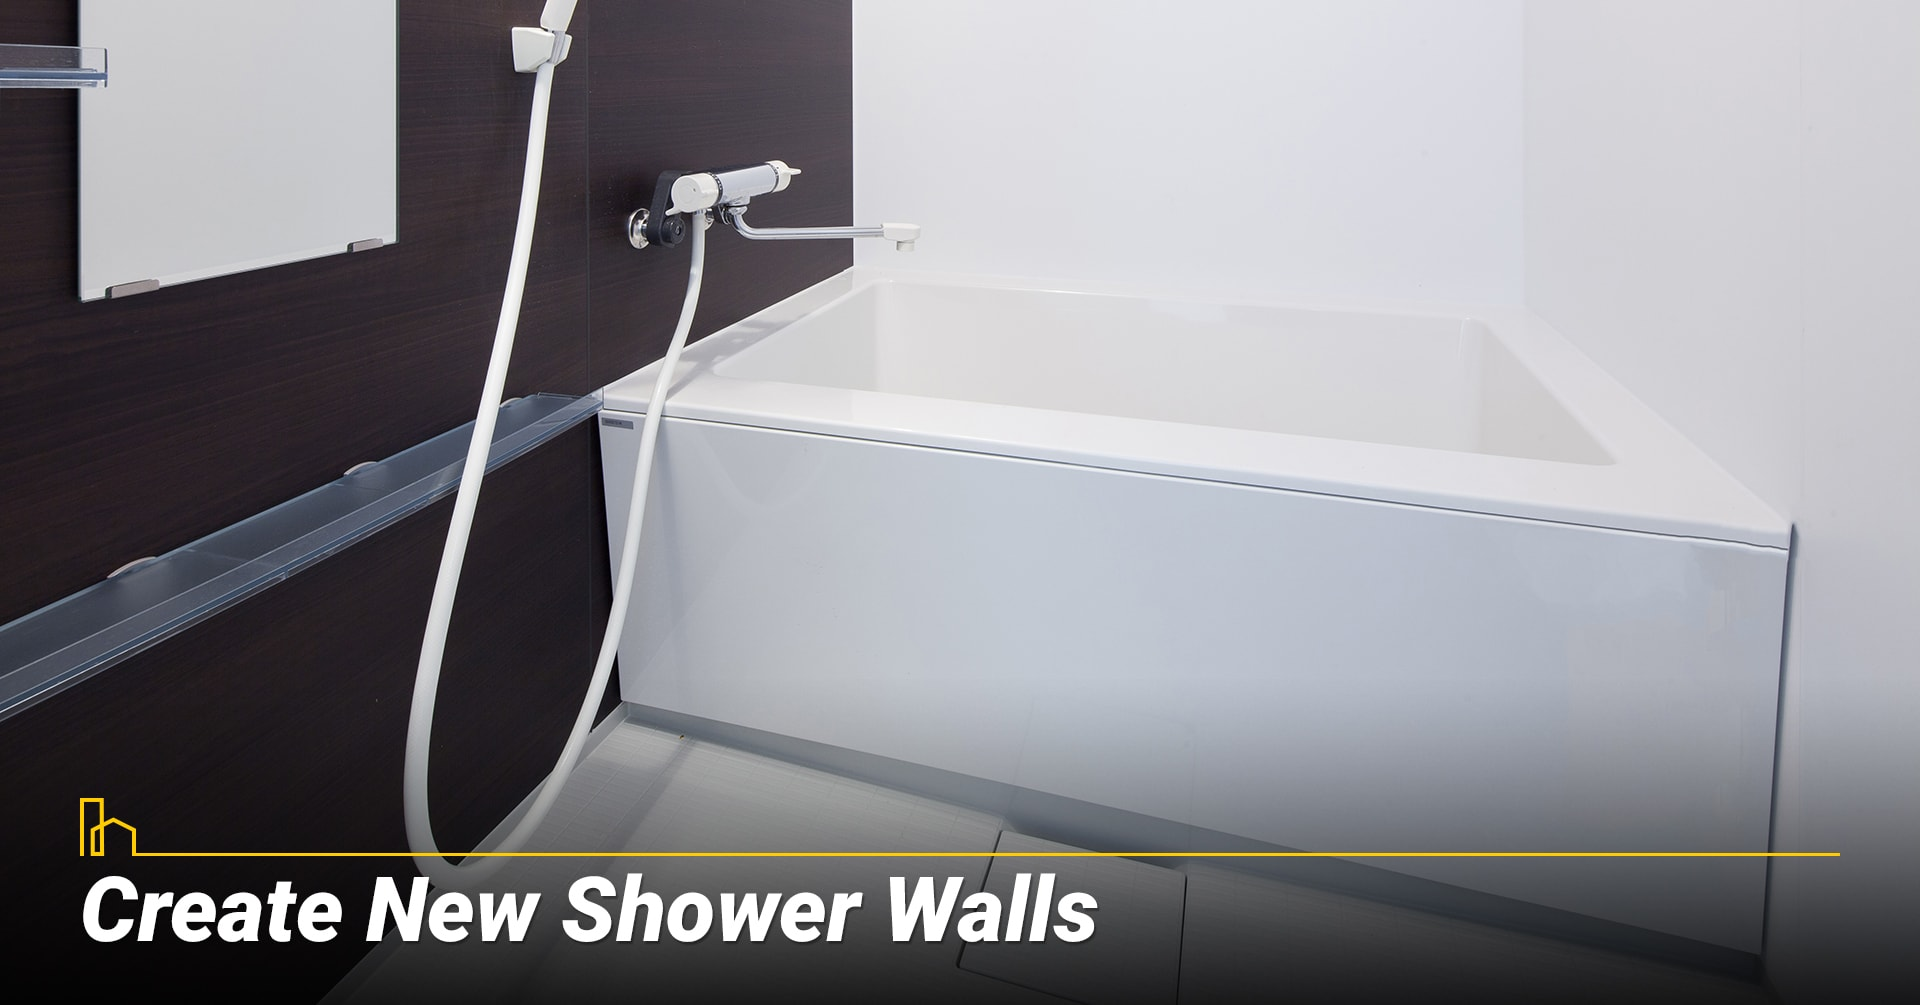 Create New Shower Walls, upgrade your bathroom